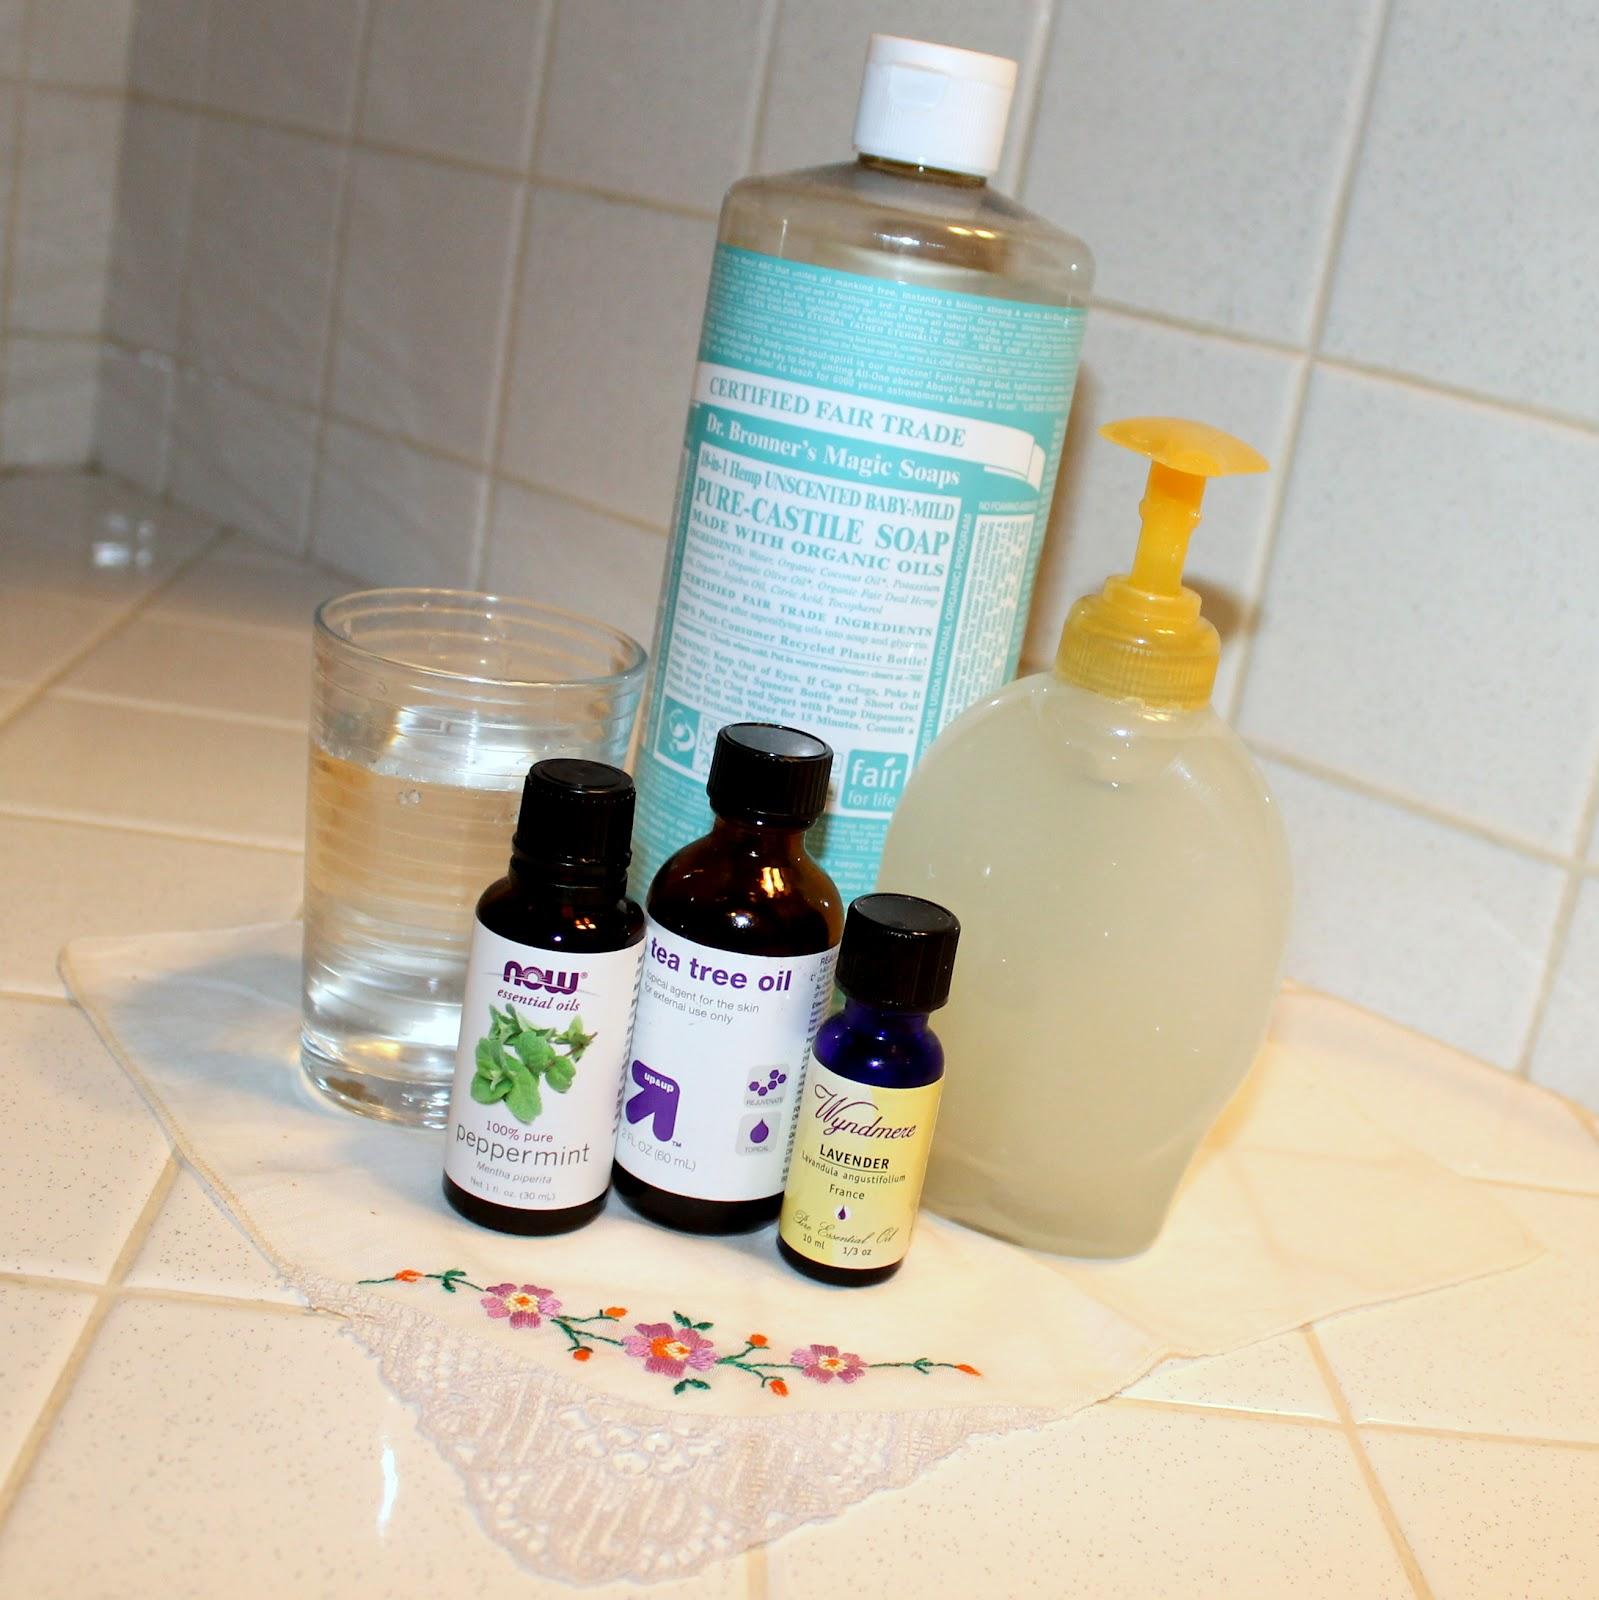 fringe benefit skin lotionRehoboth Herbal  Experiments in Soap Making  Homemade Liquid Hand UFUgIFOS